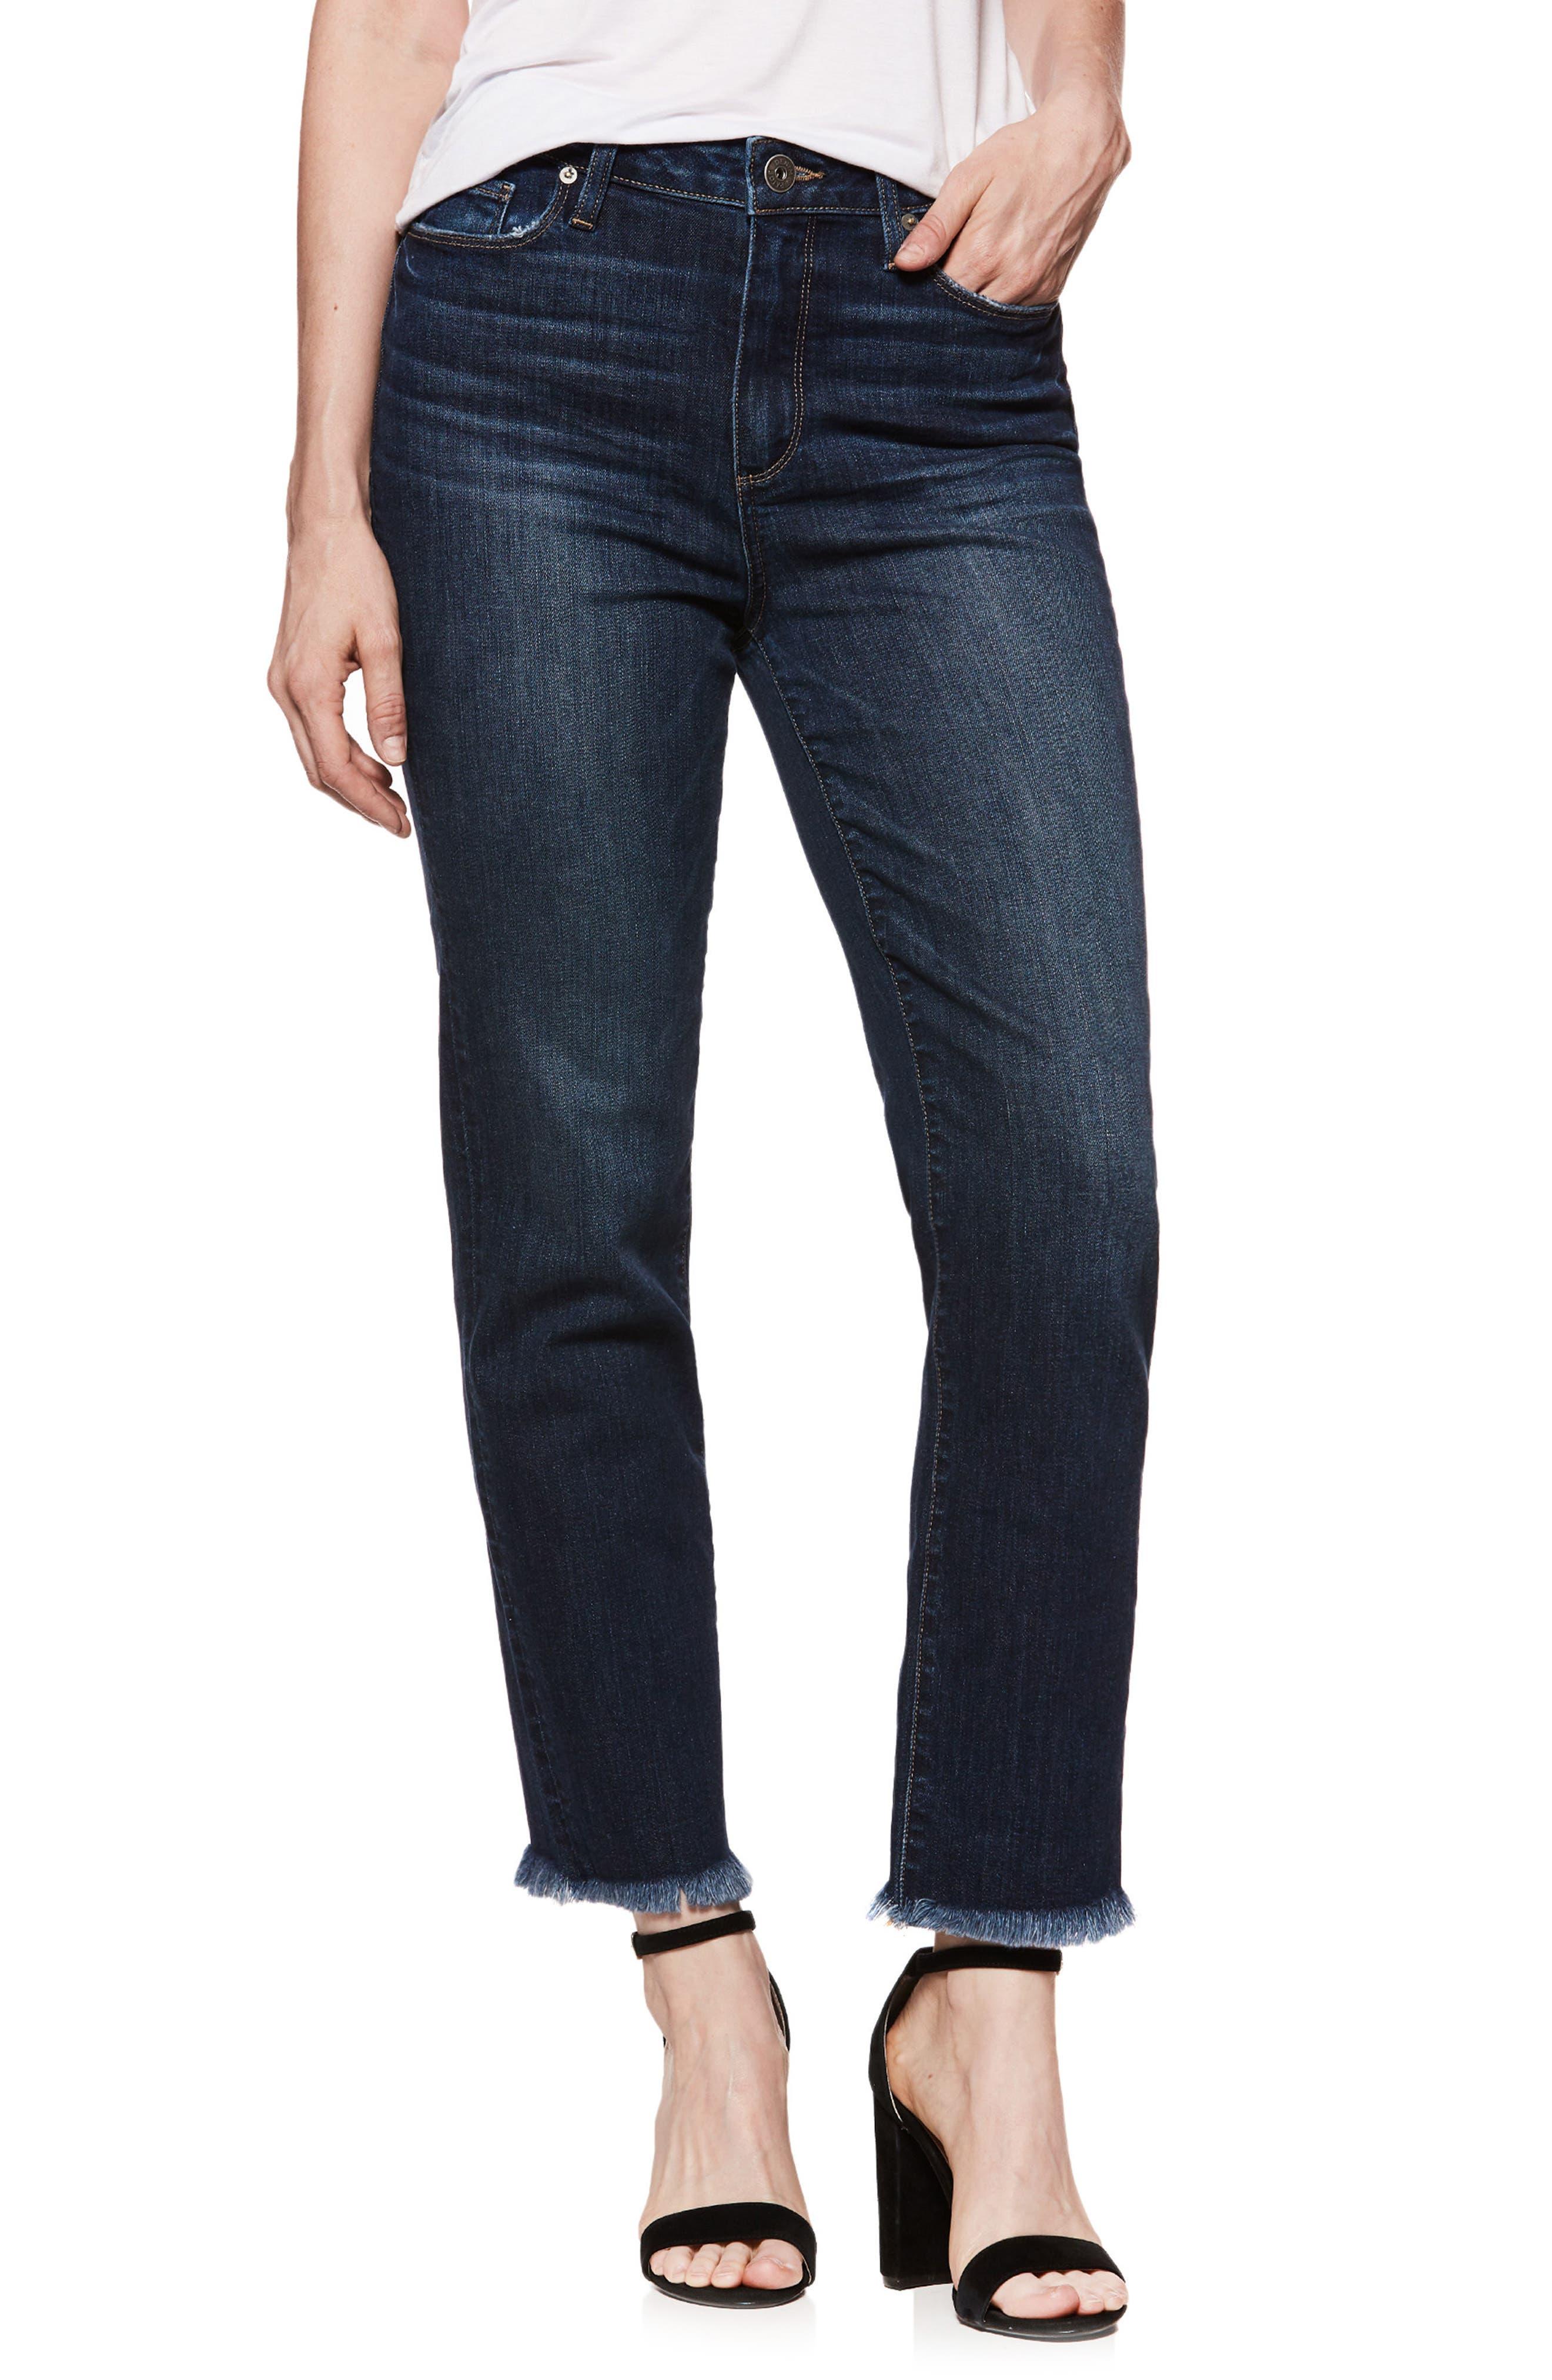 Hoxton High Waist Ankle Straight Leg Jeans,                             Main thumbnail 1, color,                             Mazzetti